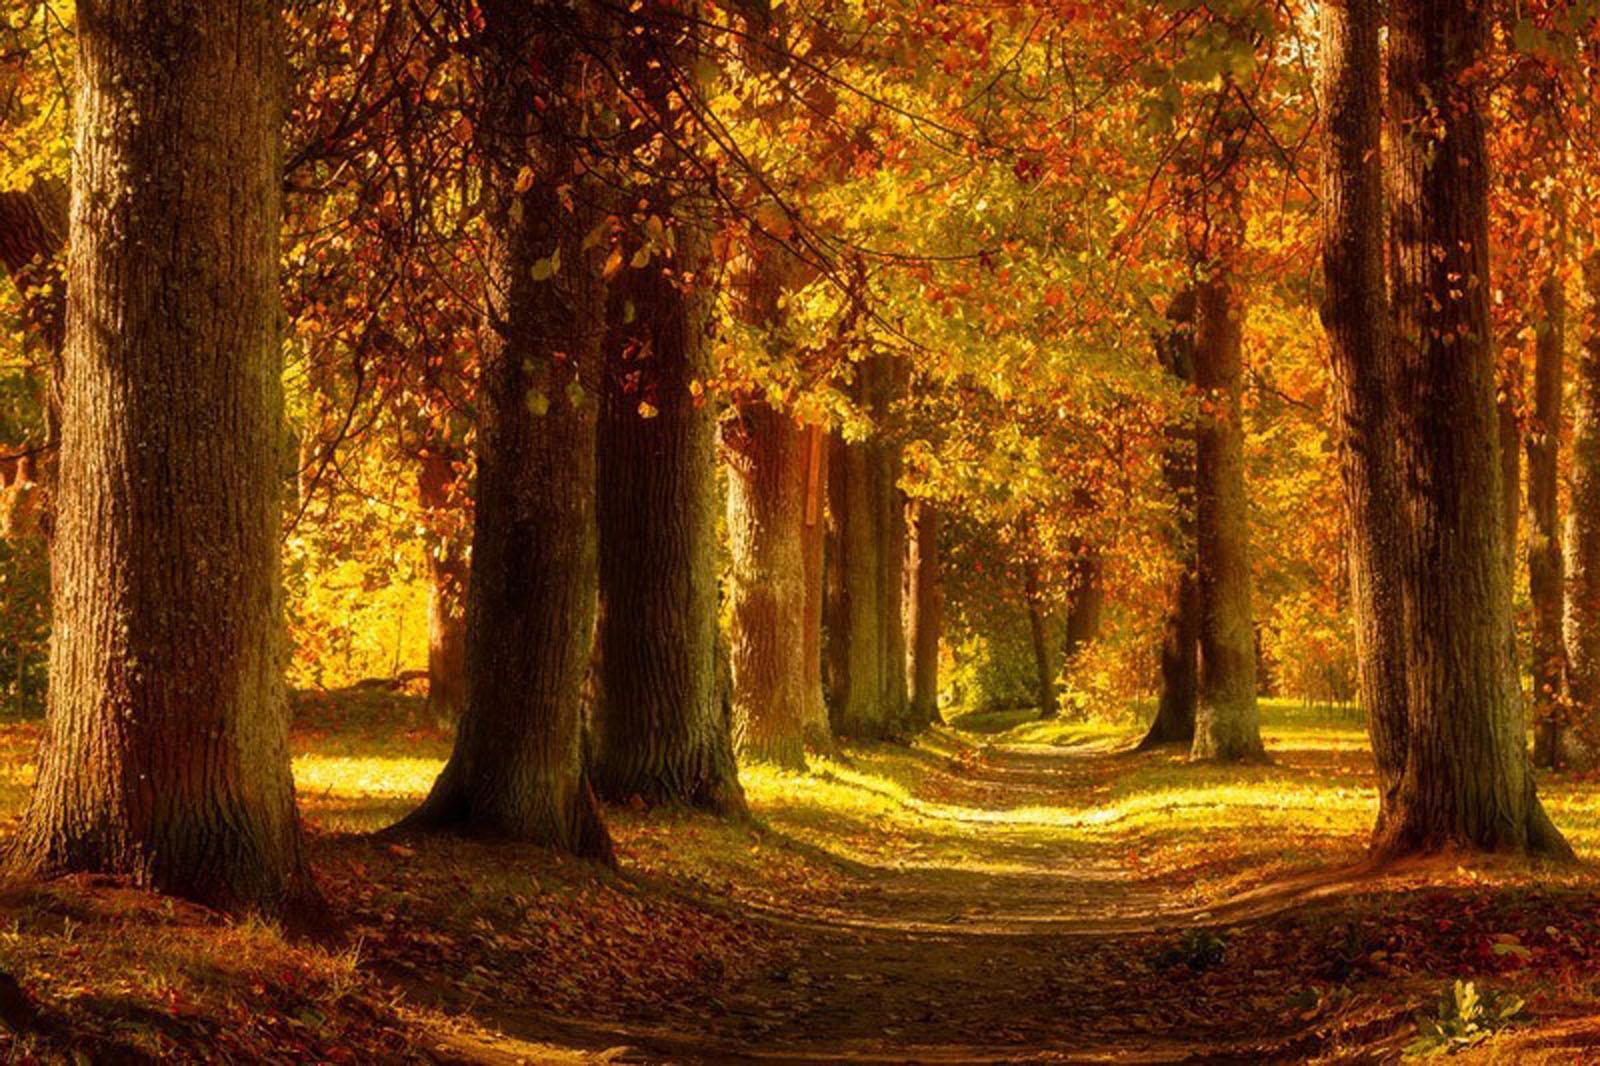 Autumn Alley Image